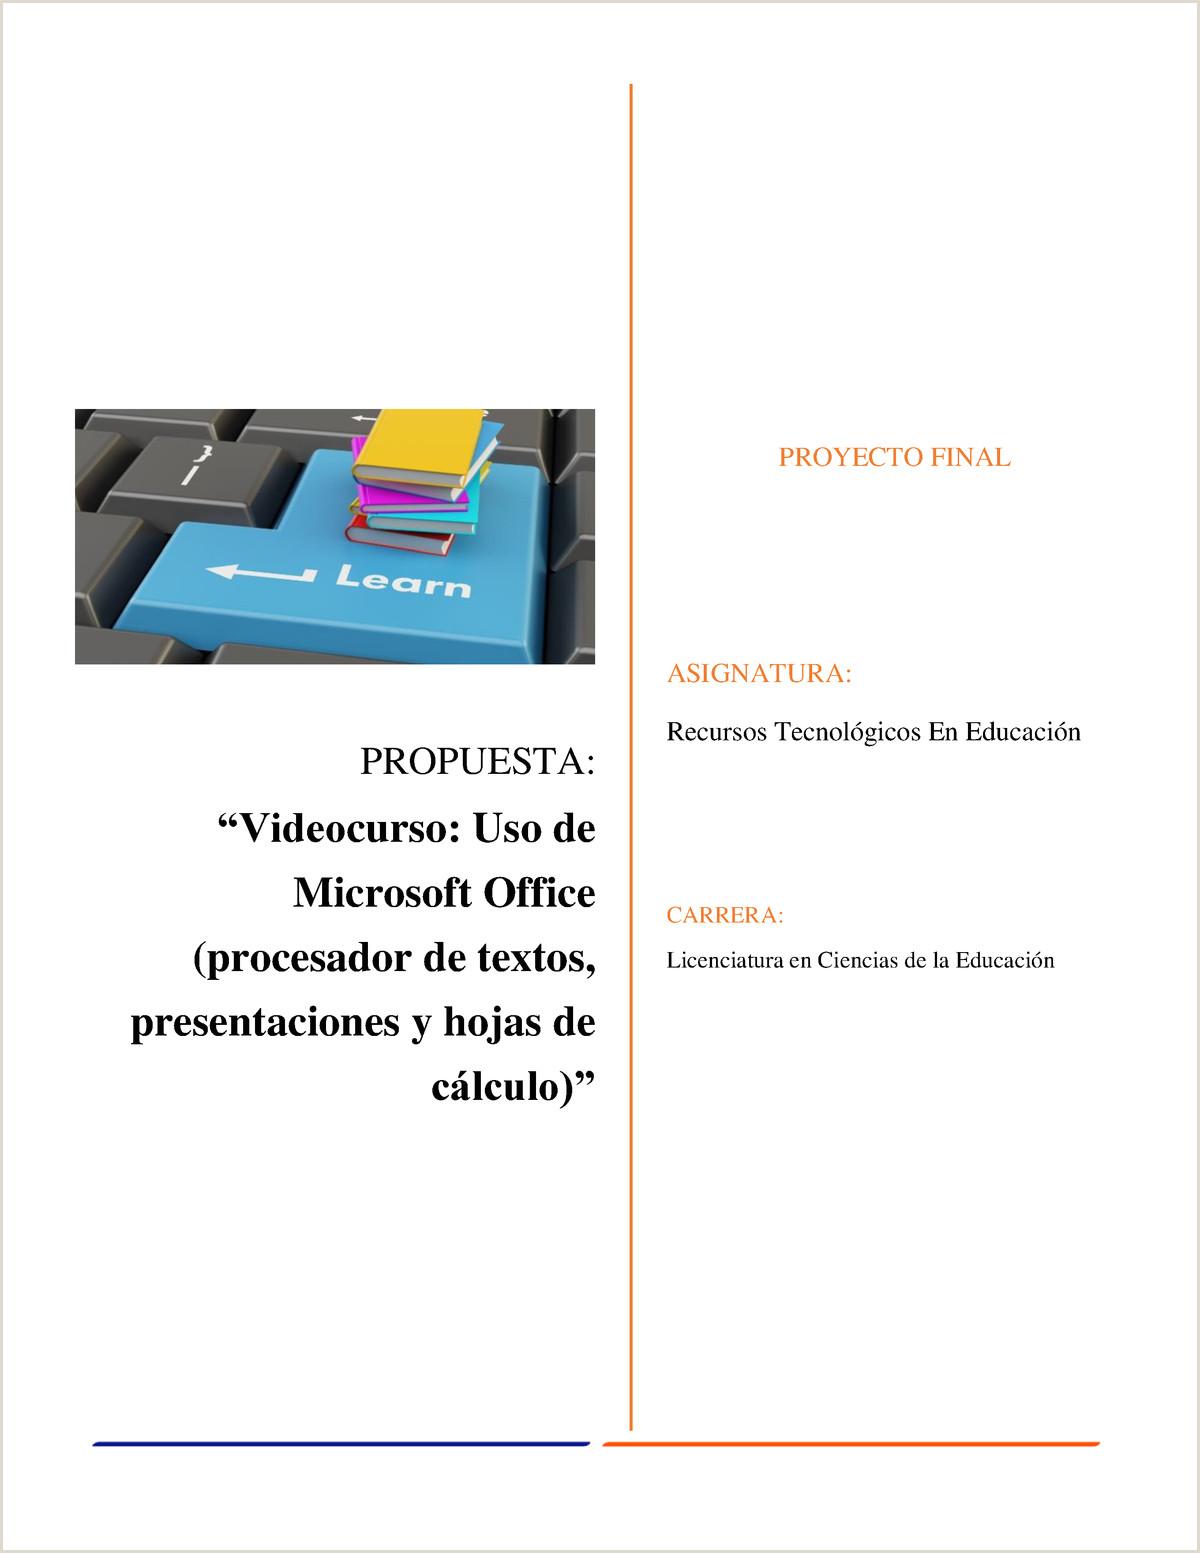 Photo of Hoja De Vida formato Unico Excel